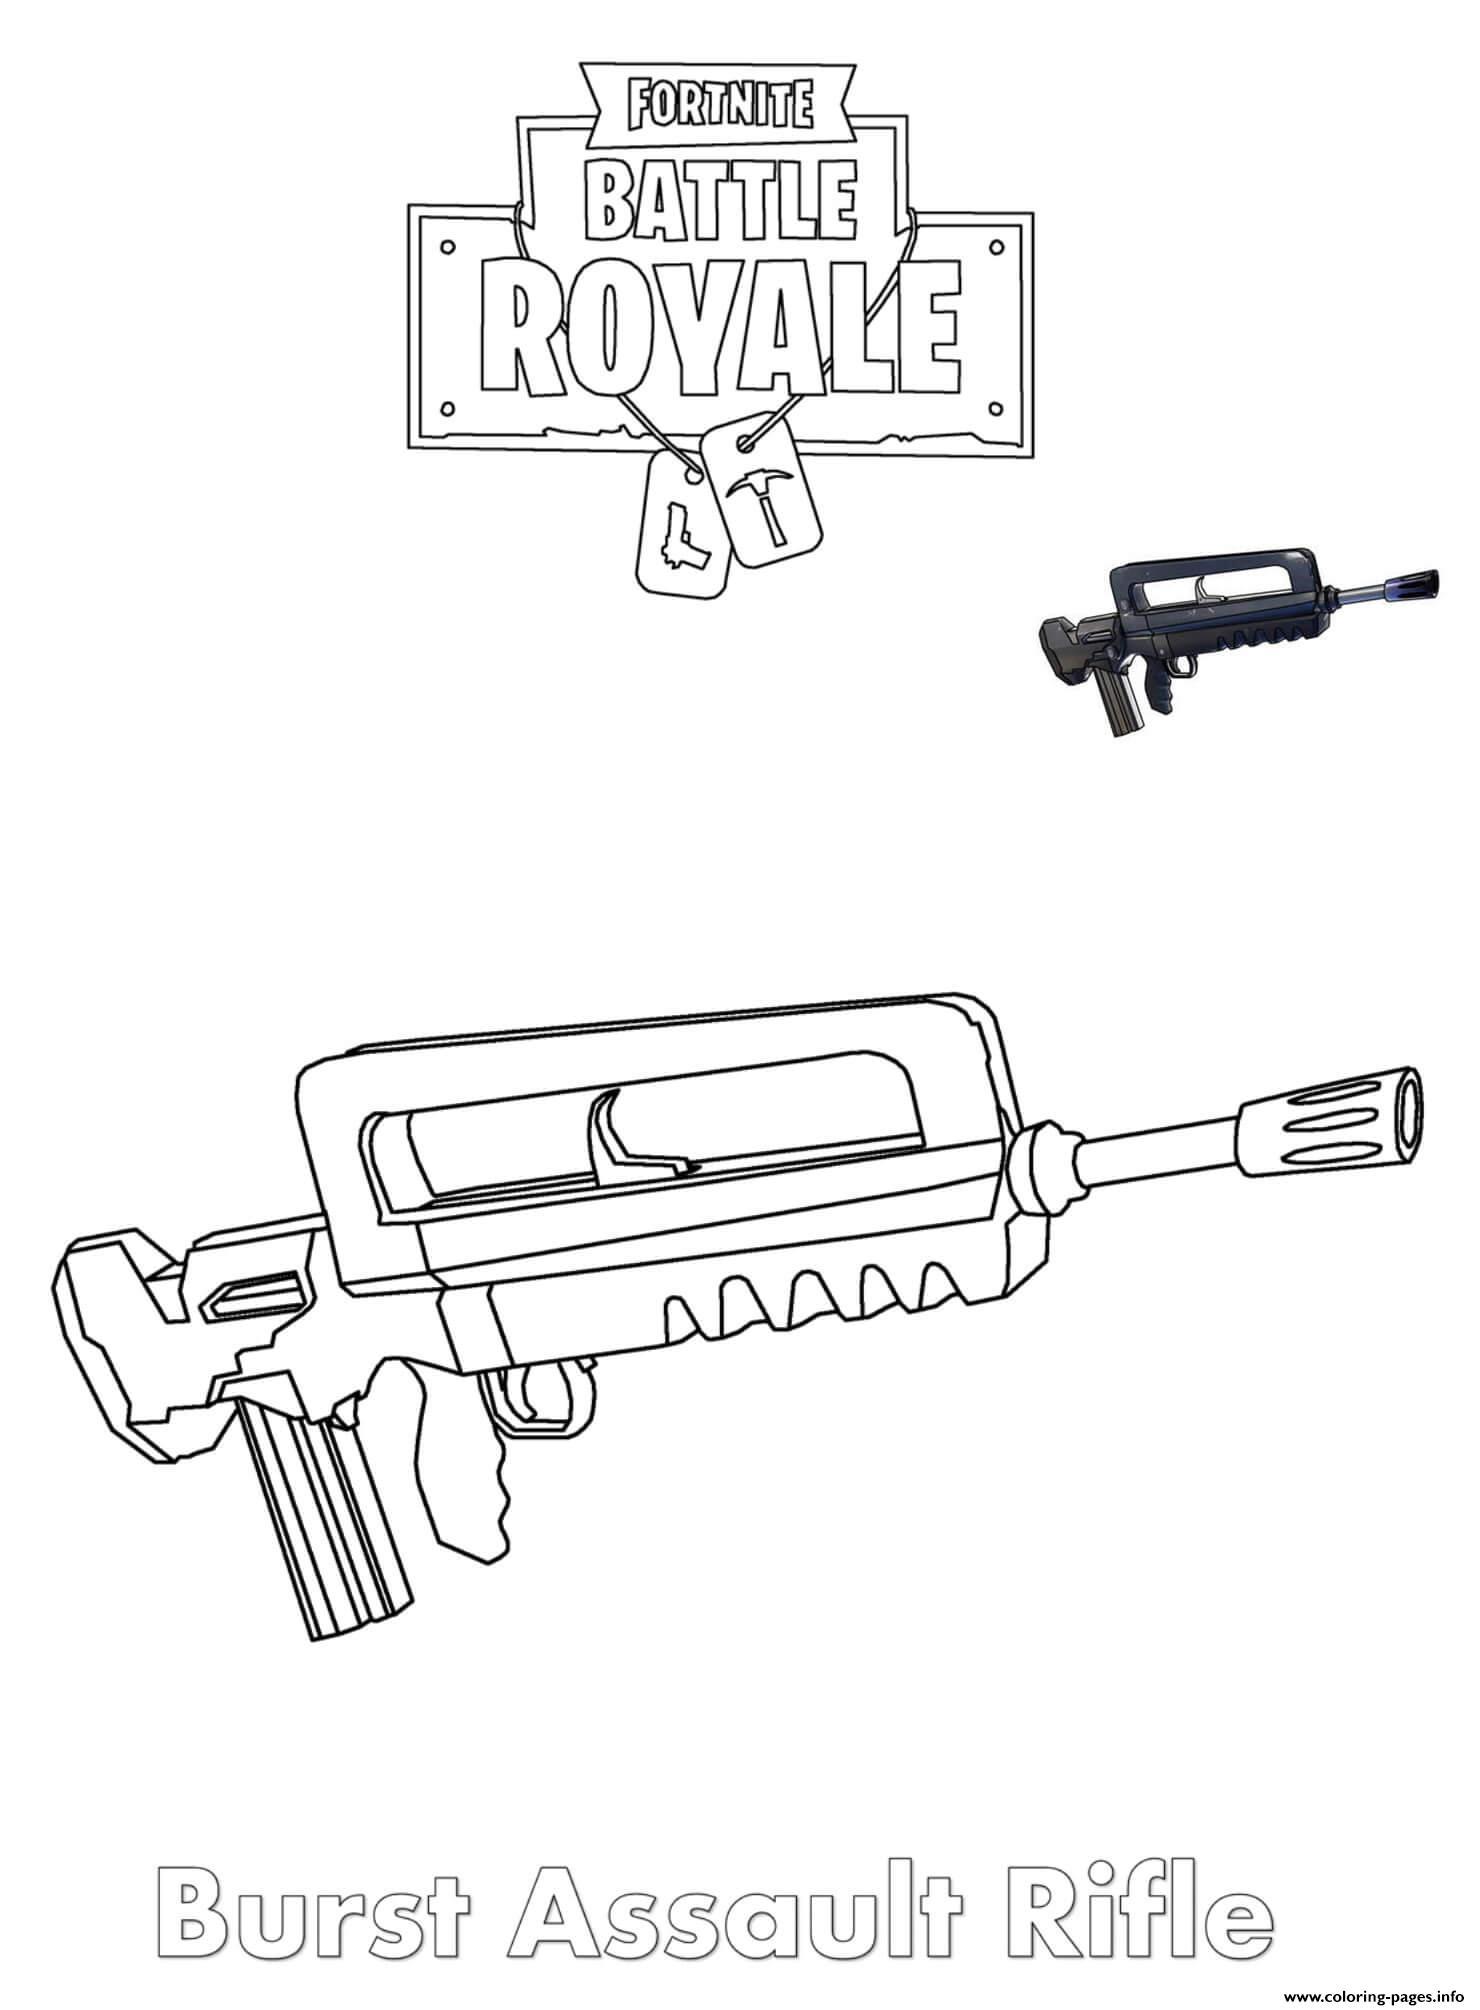 Burst Assault Rifle Fortnite Coloring Pages Printable